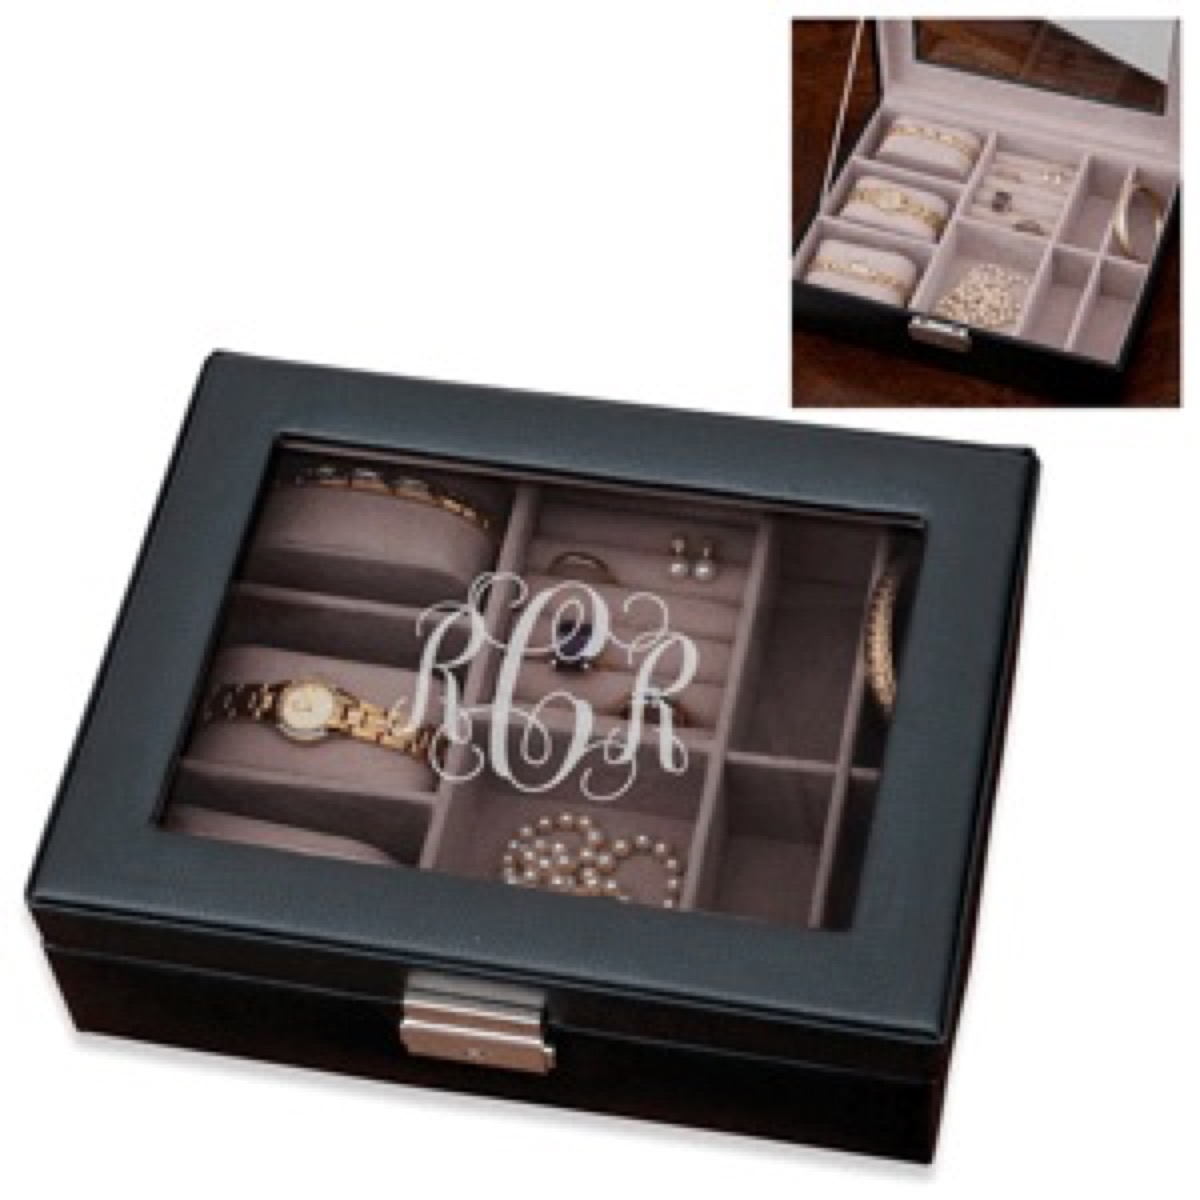 monogrammed jewelry box, best friend gifts